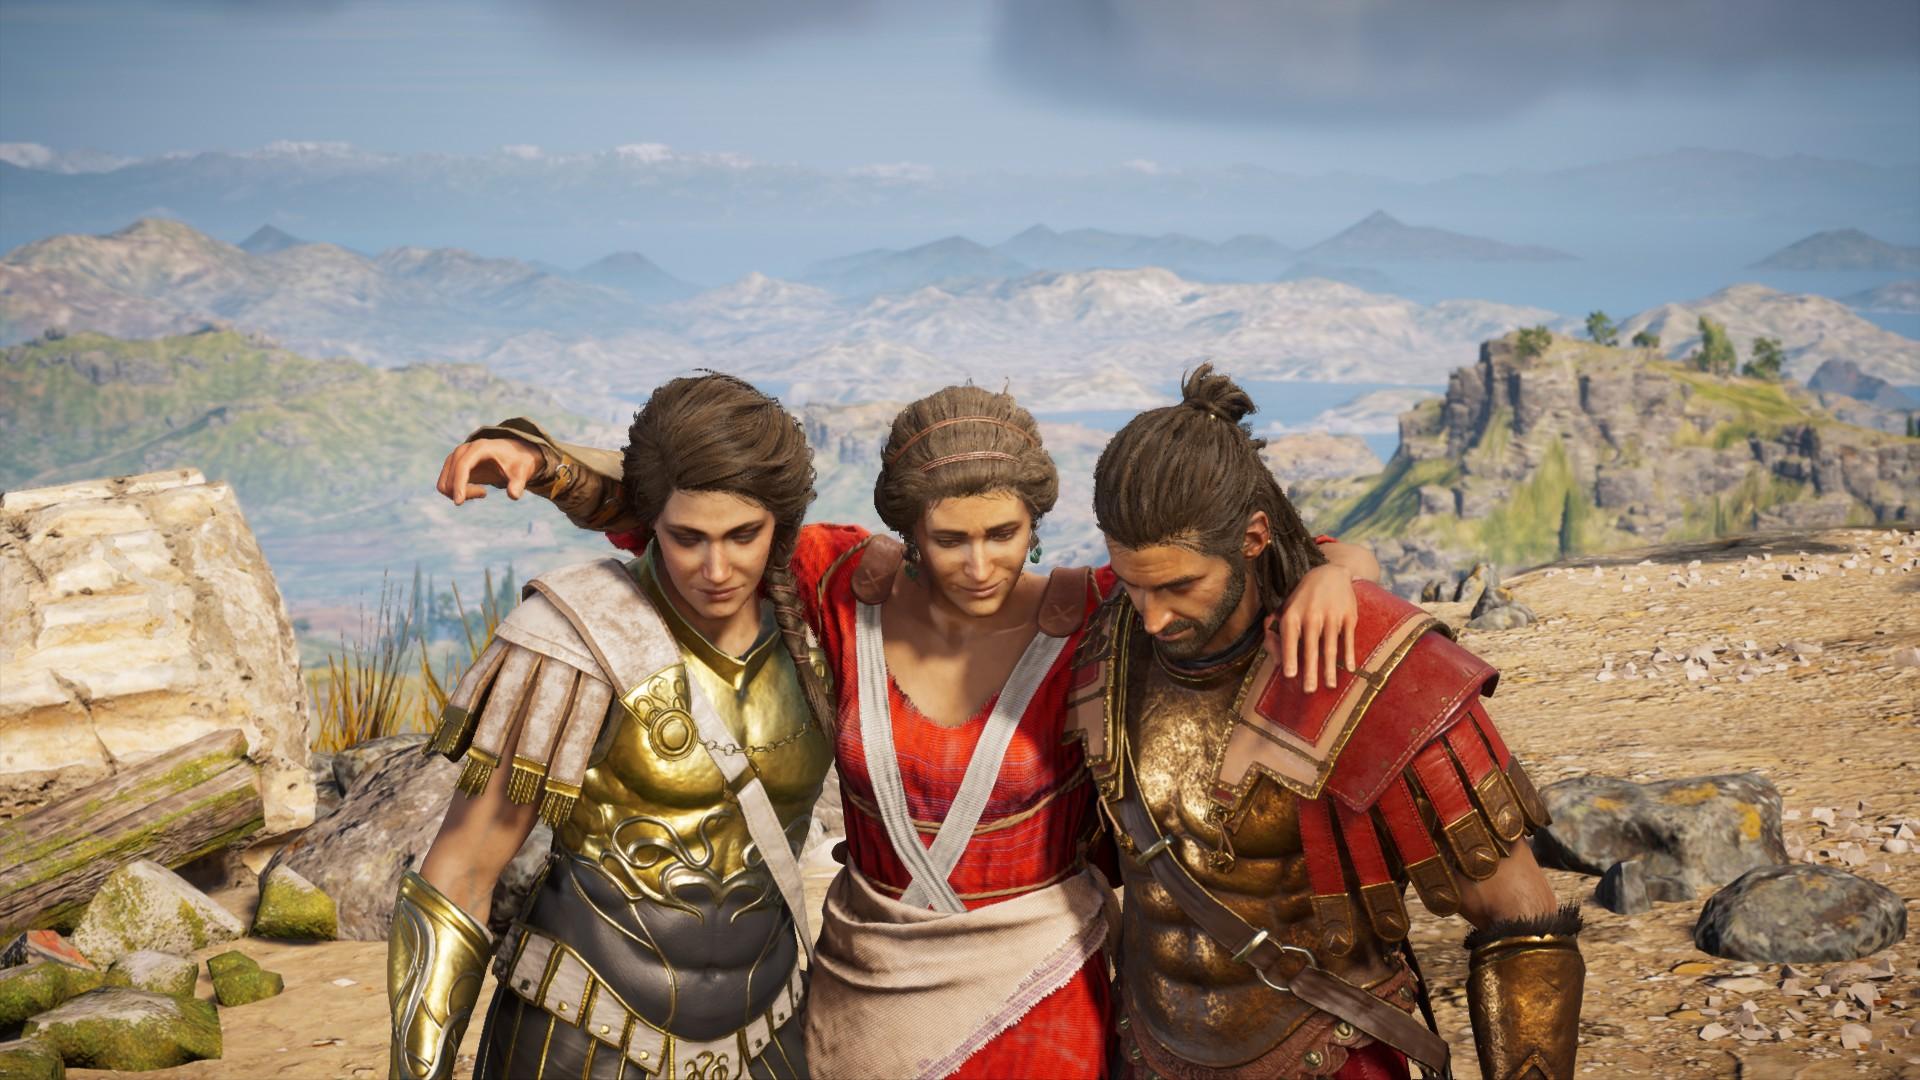 20181102233851_1.jpg - Assassin's Creed: Odyssey